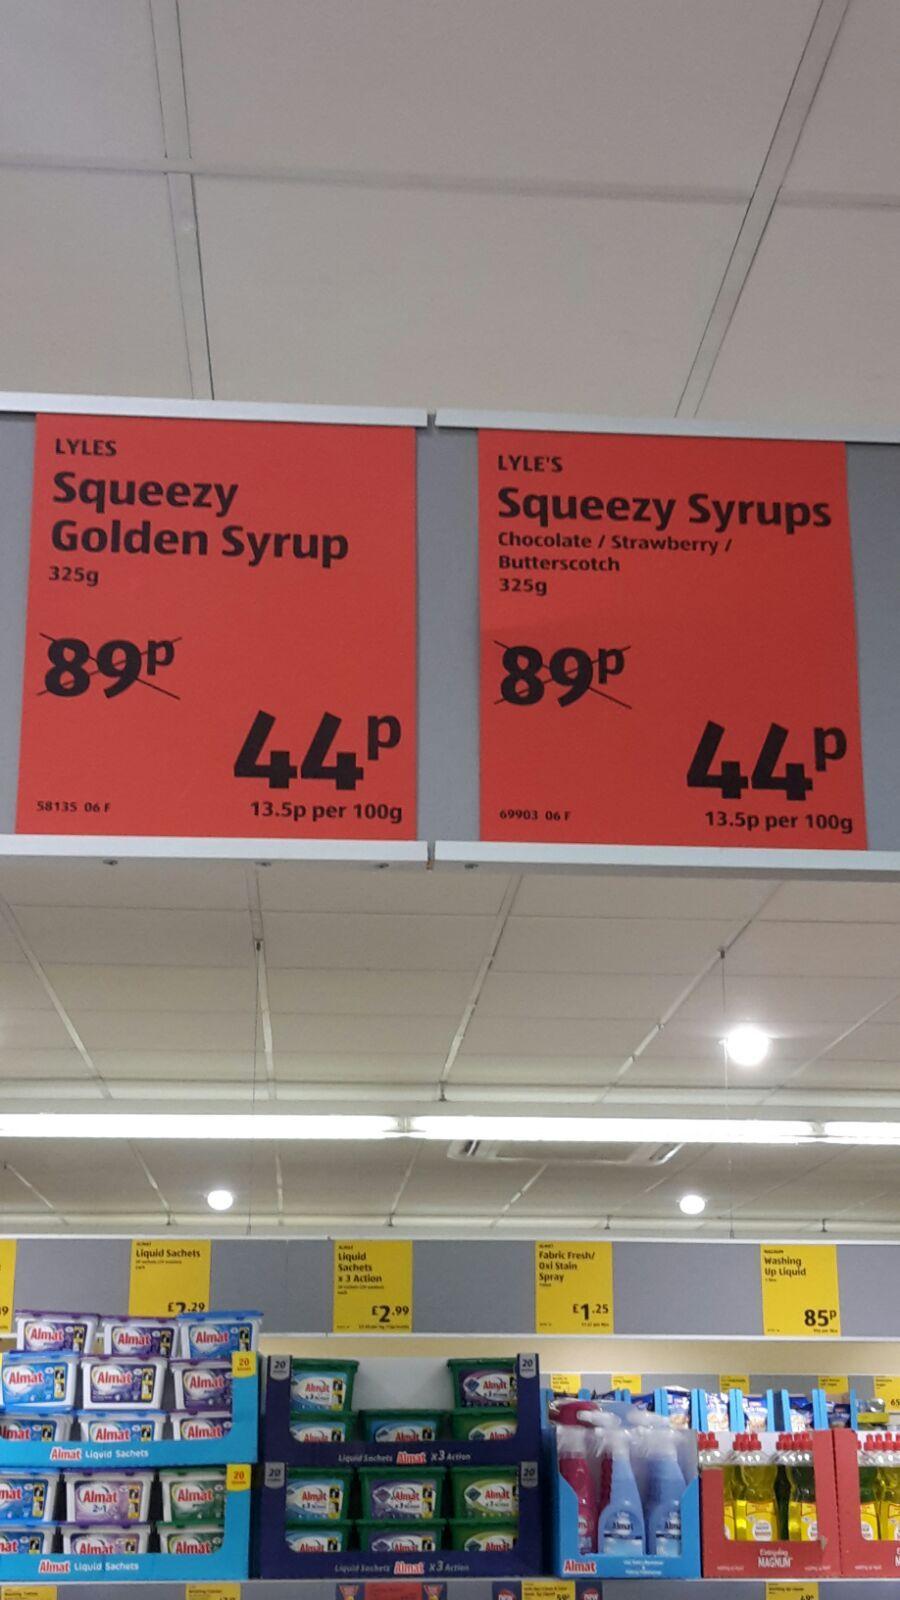 Lyles squeezy golden syrup 44p @ Aldi